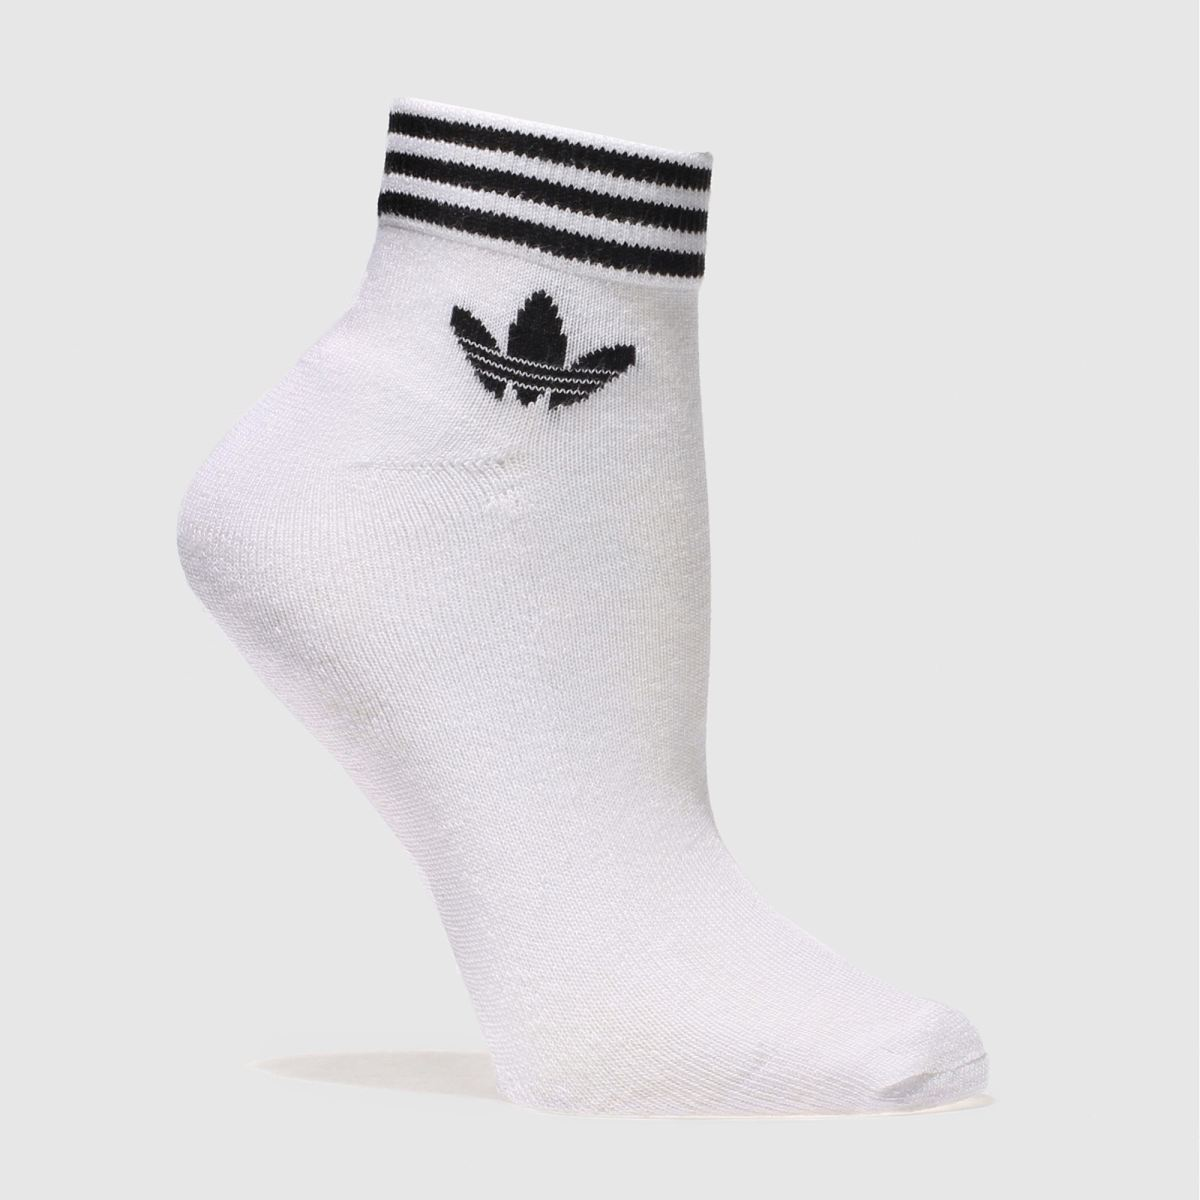 Adidas Adidas White Trefoil Ankle Sock 3 Pack